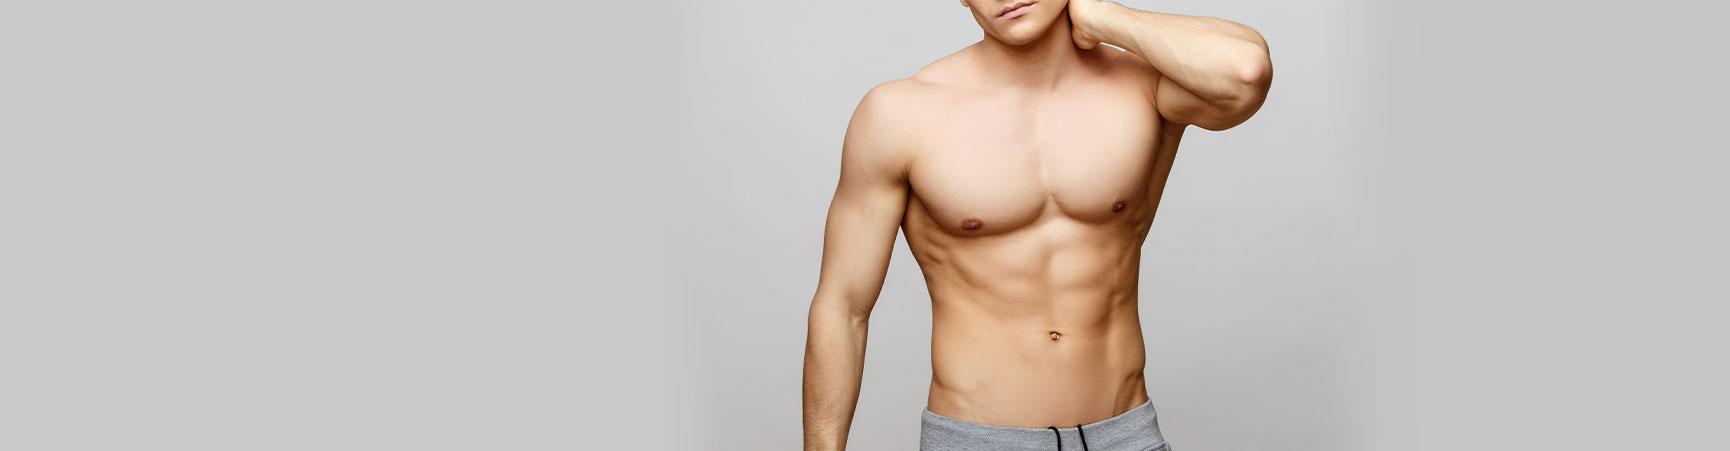 male model posing showing torso musles